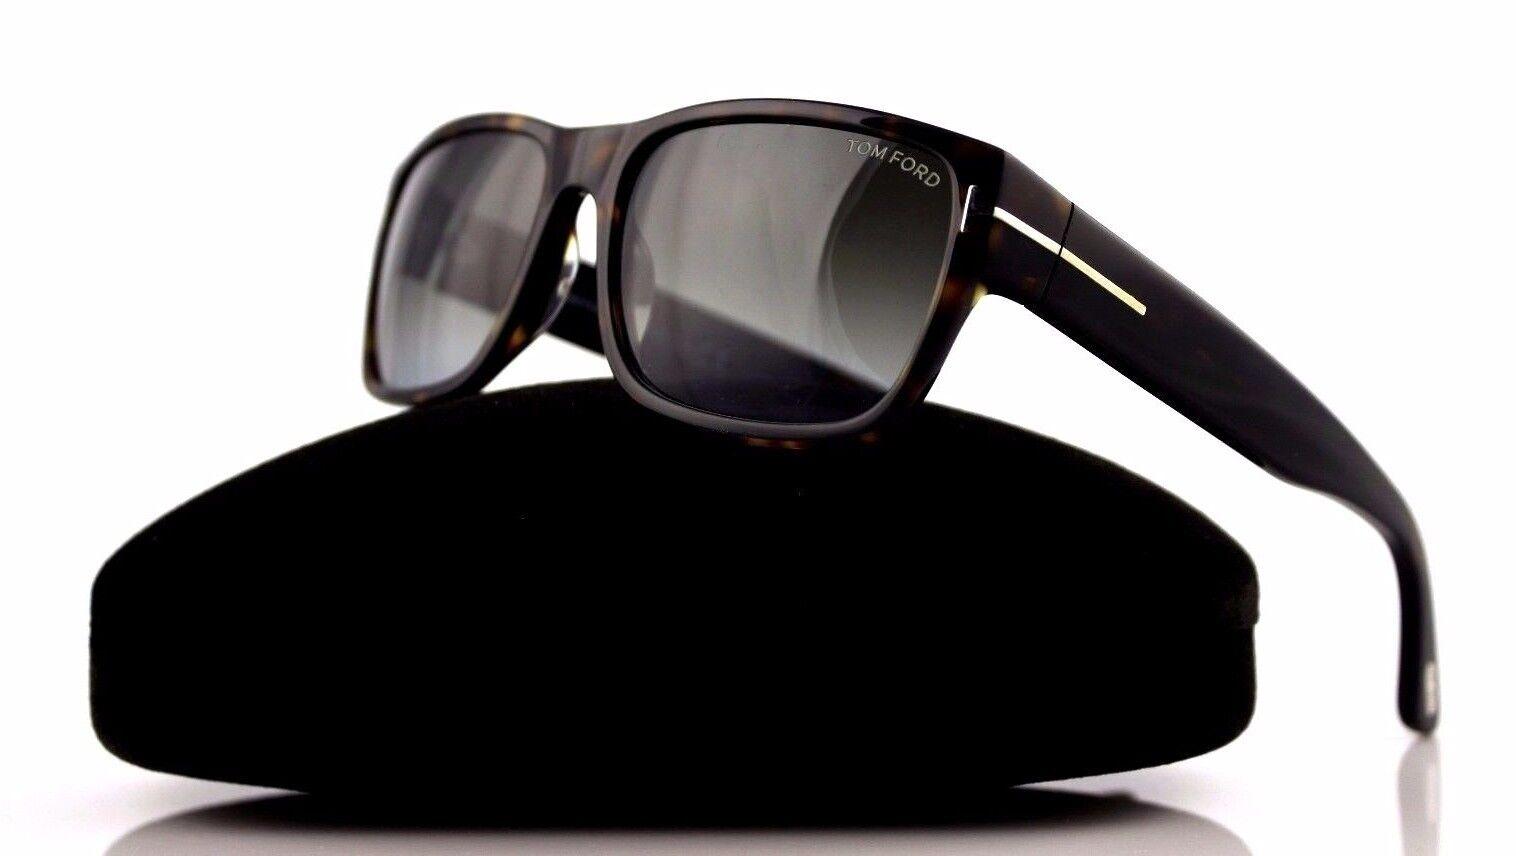 27edf410a79 Tom Ford Sunglasses TF 445 Mason 52b Havana 58mm for sale online